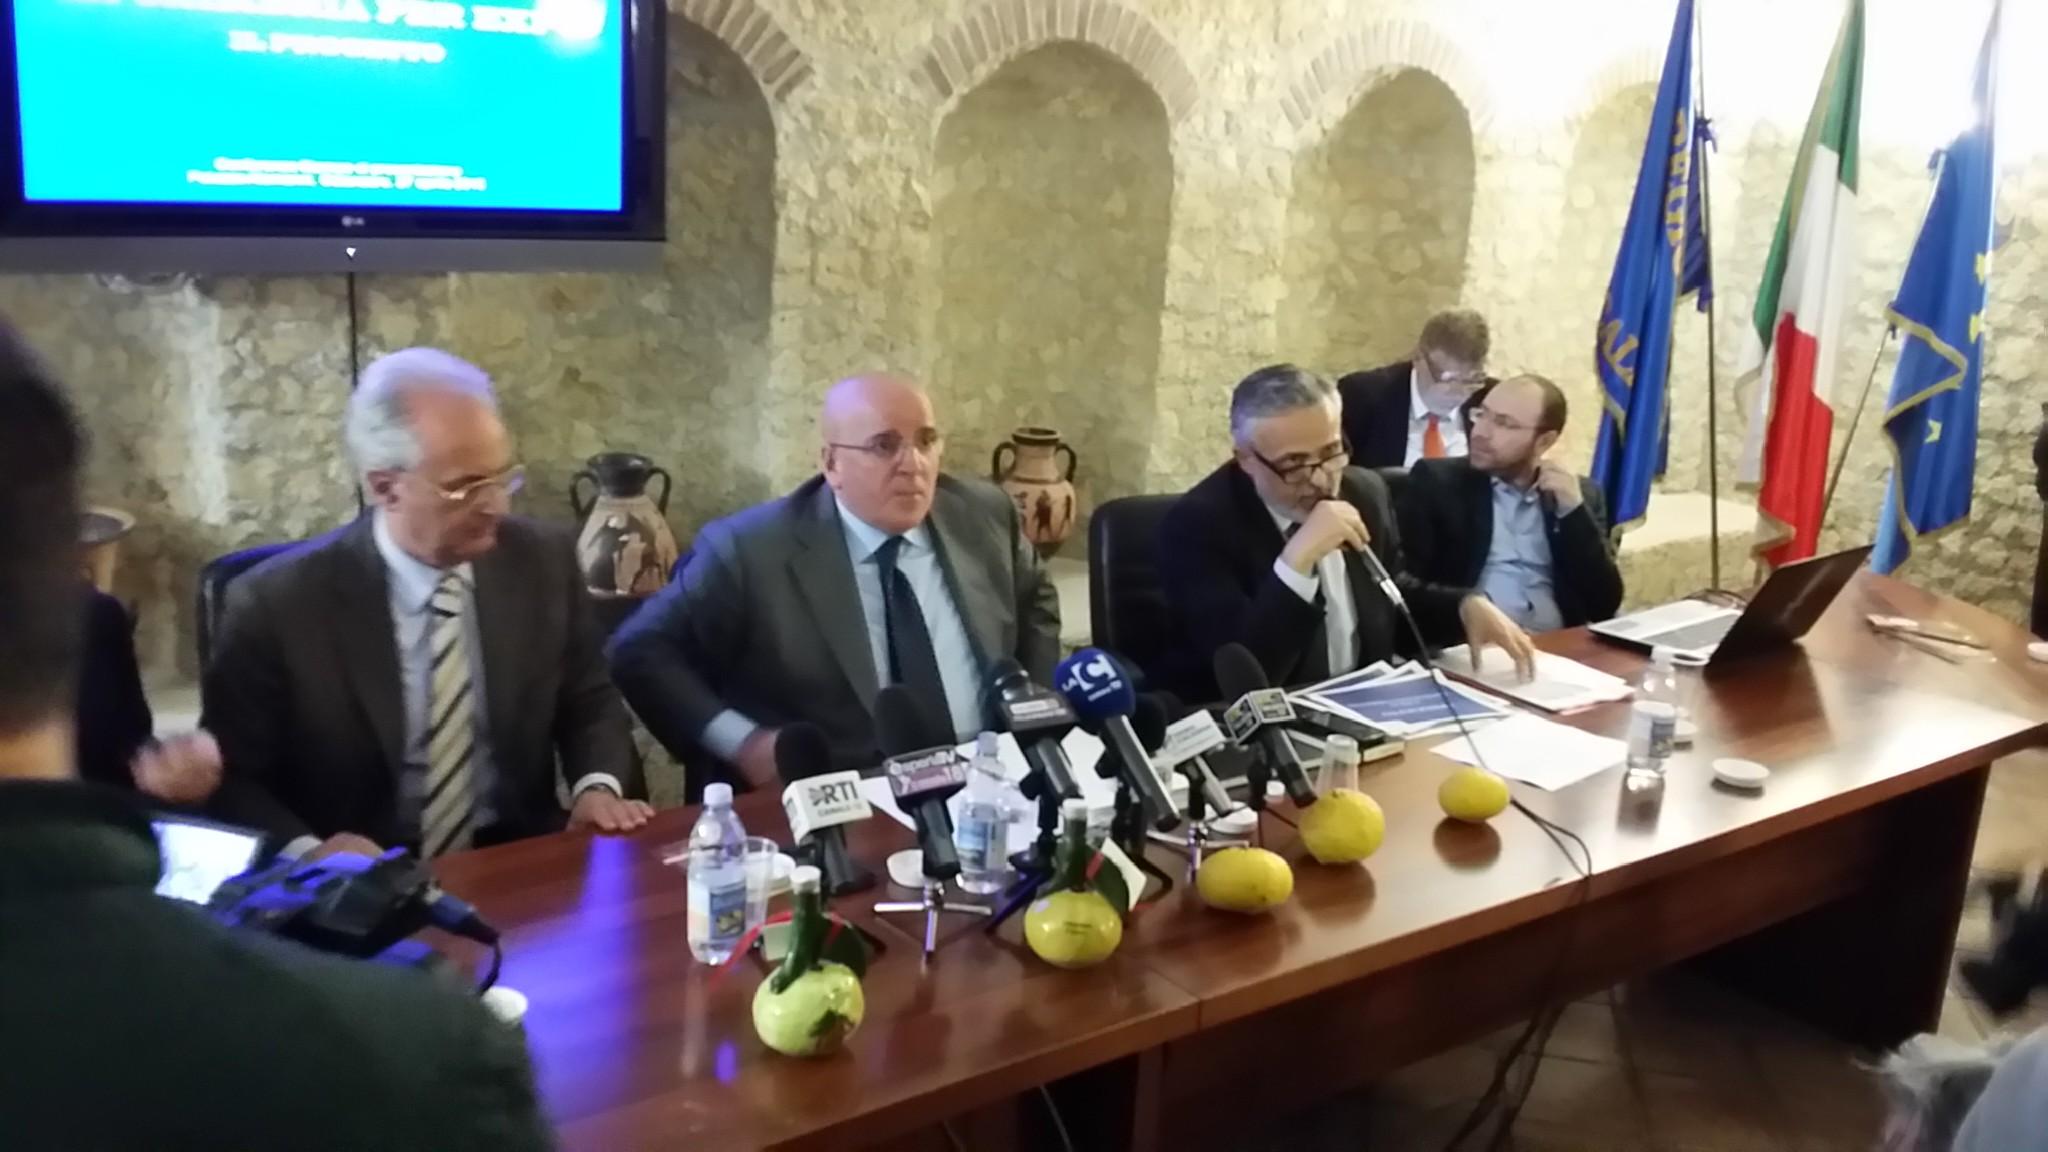 Oliverio presenta Expo 2015 Calabria